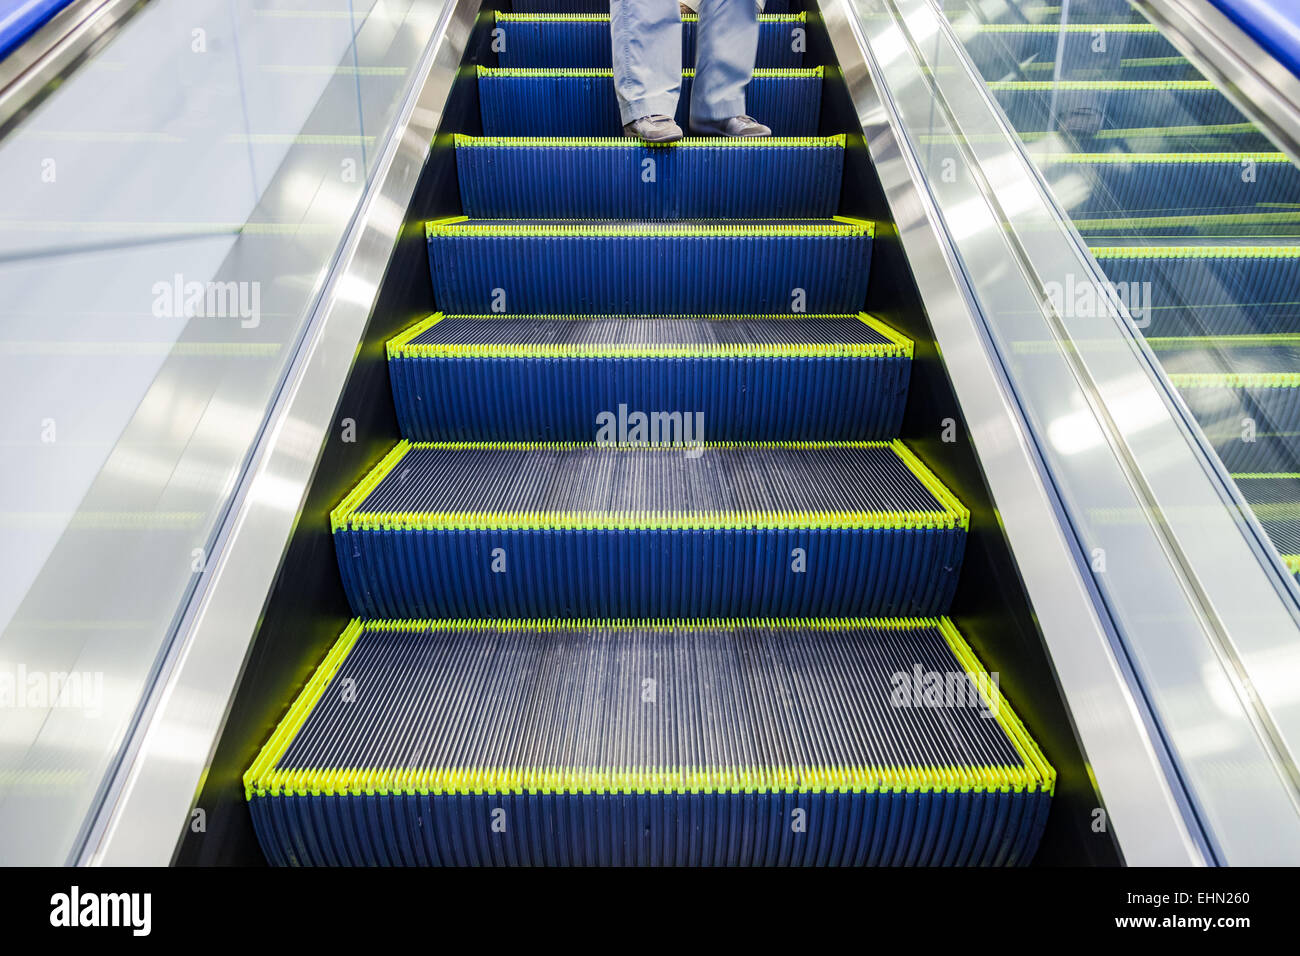 Escalator. - Stock Image